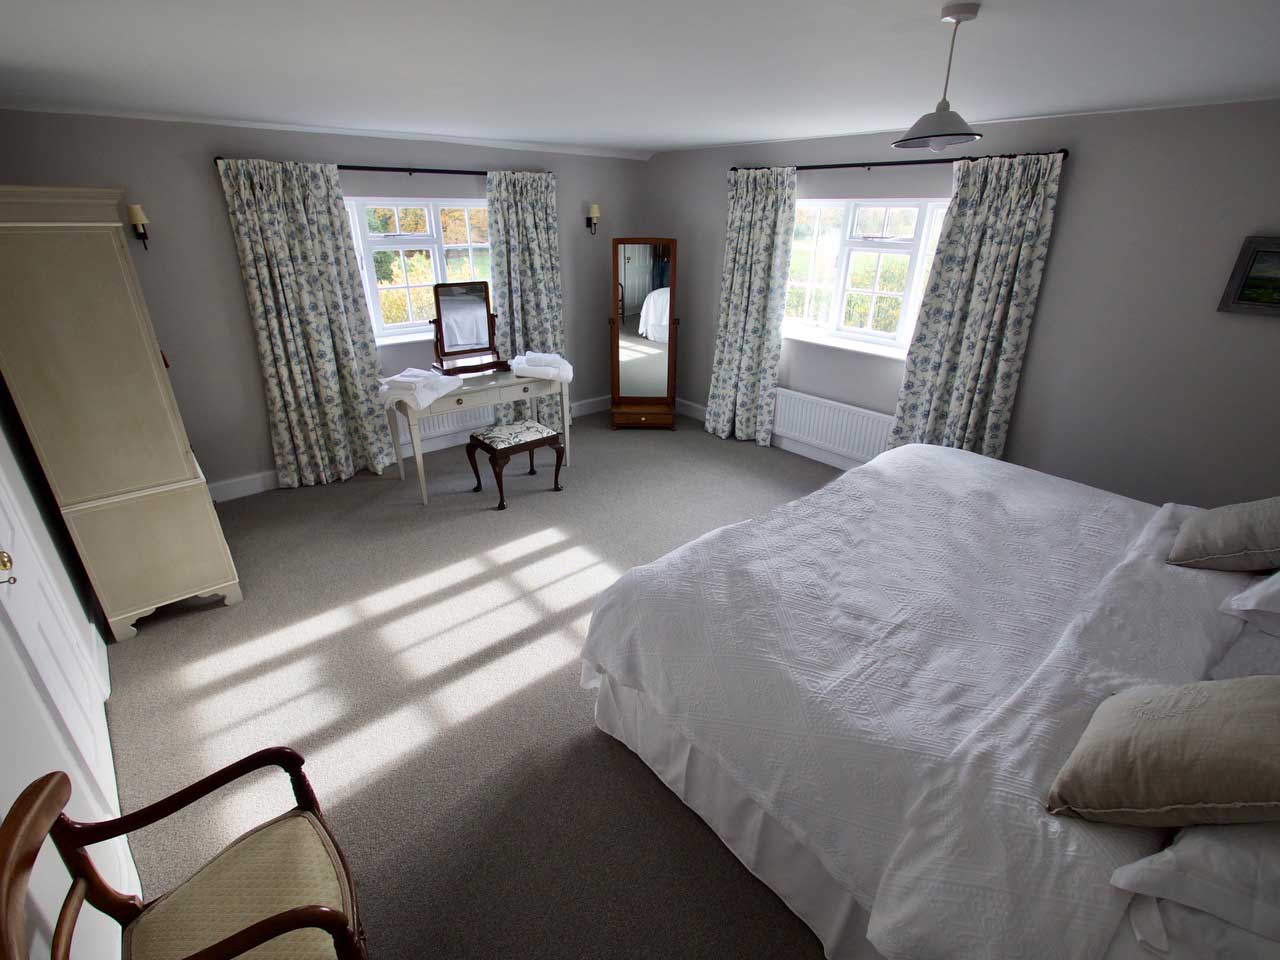 The Garden Cottage Bridal Suite - wedding accommodation in Dorset